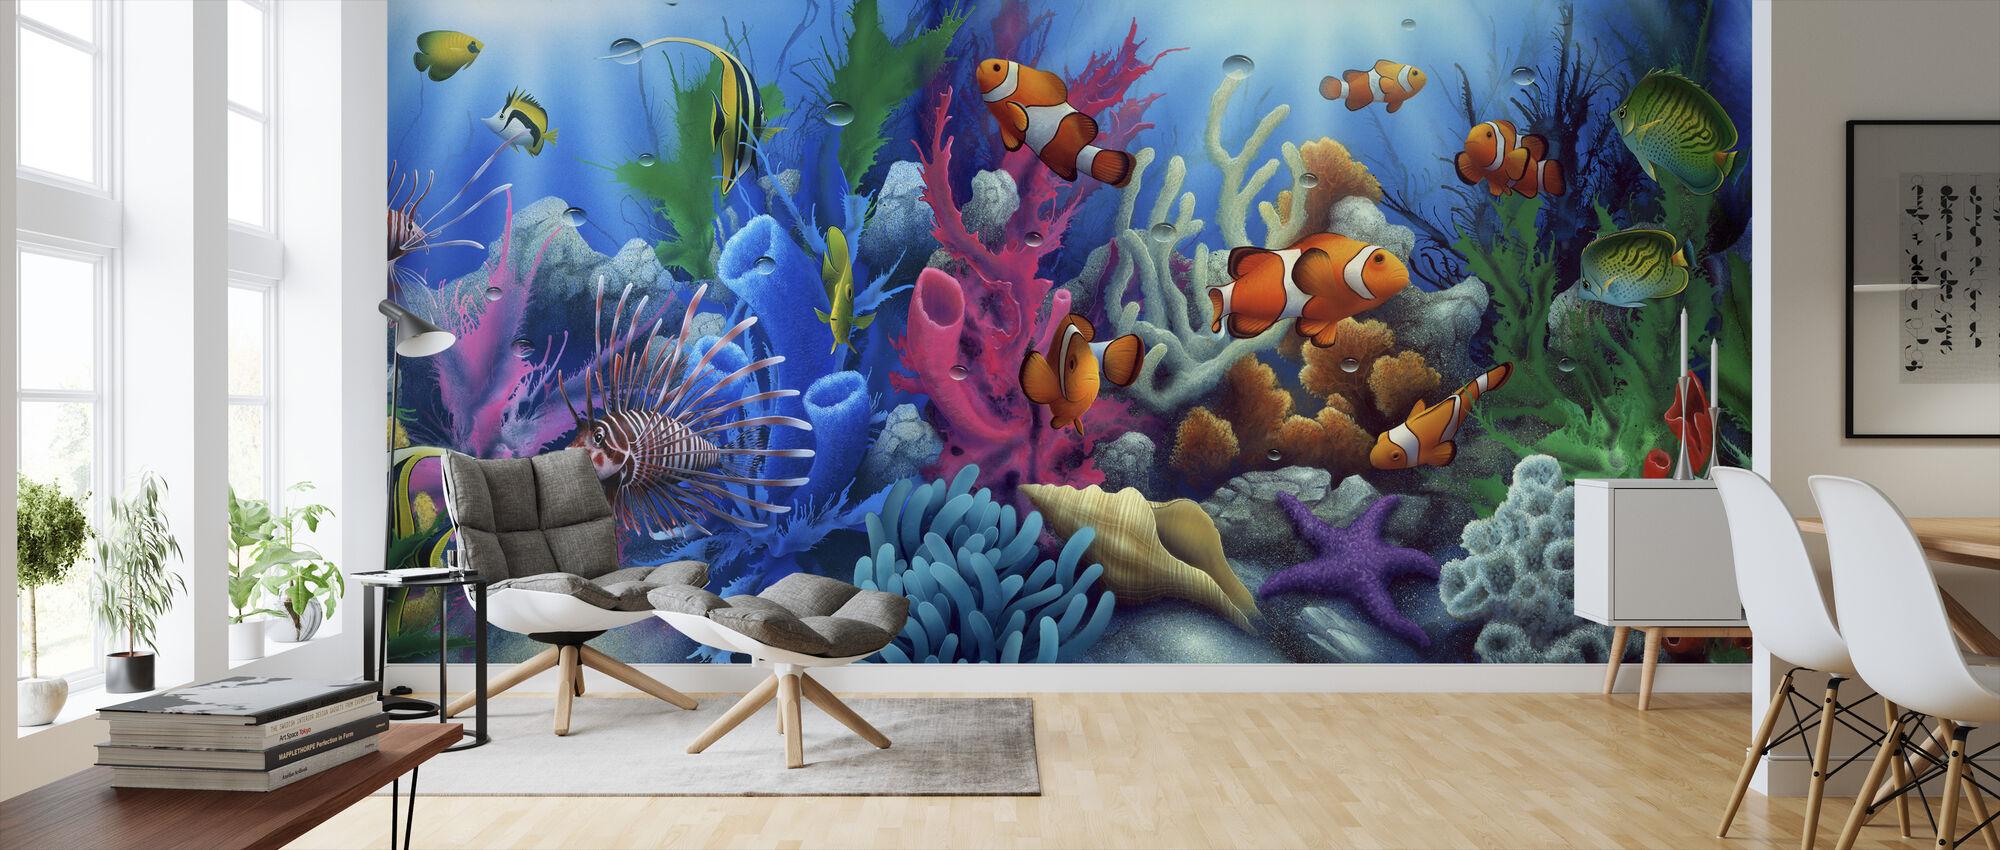 Around The World 2 - Wallpaper - Living Room